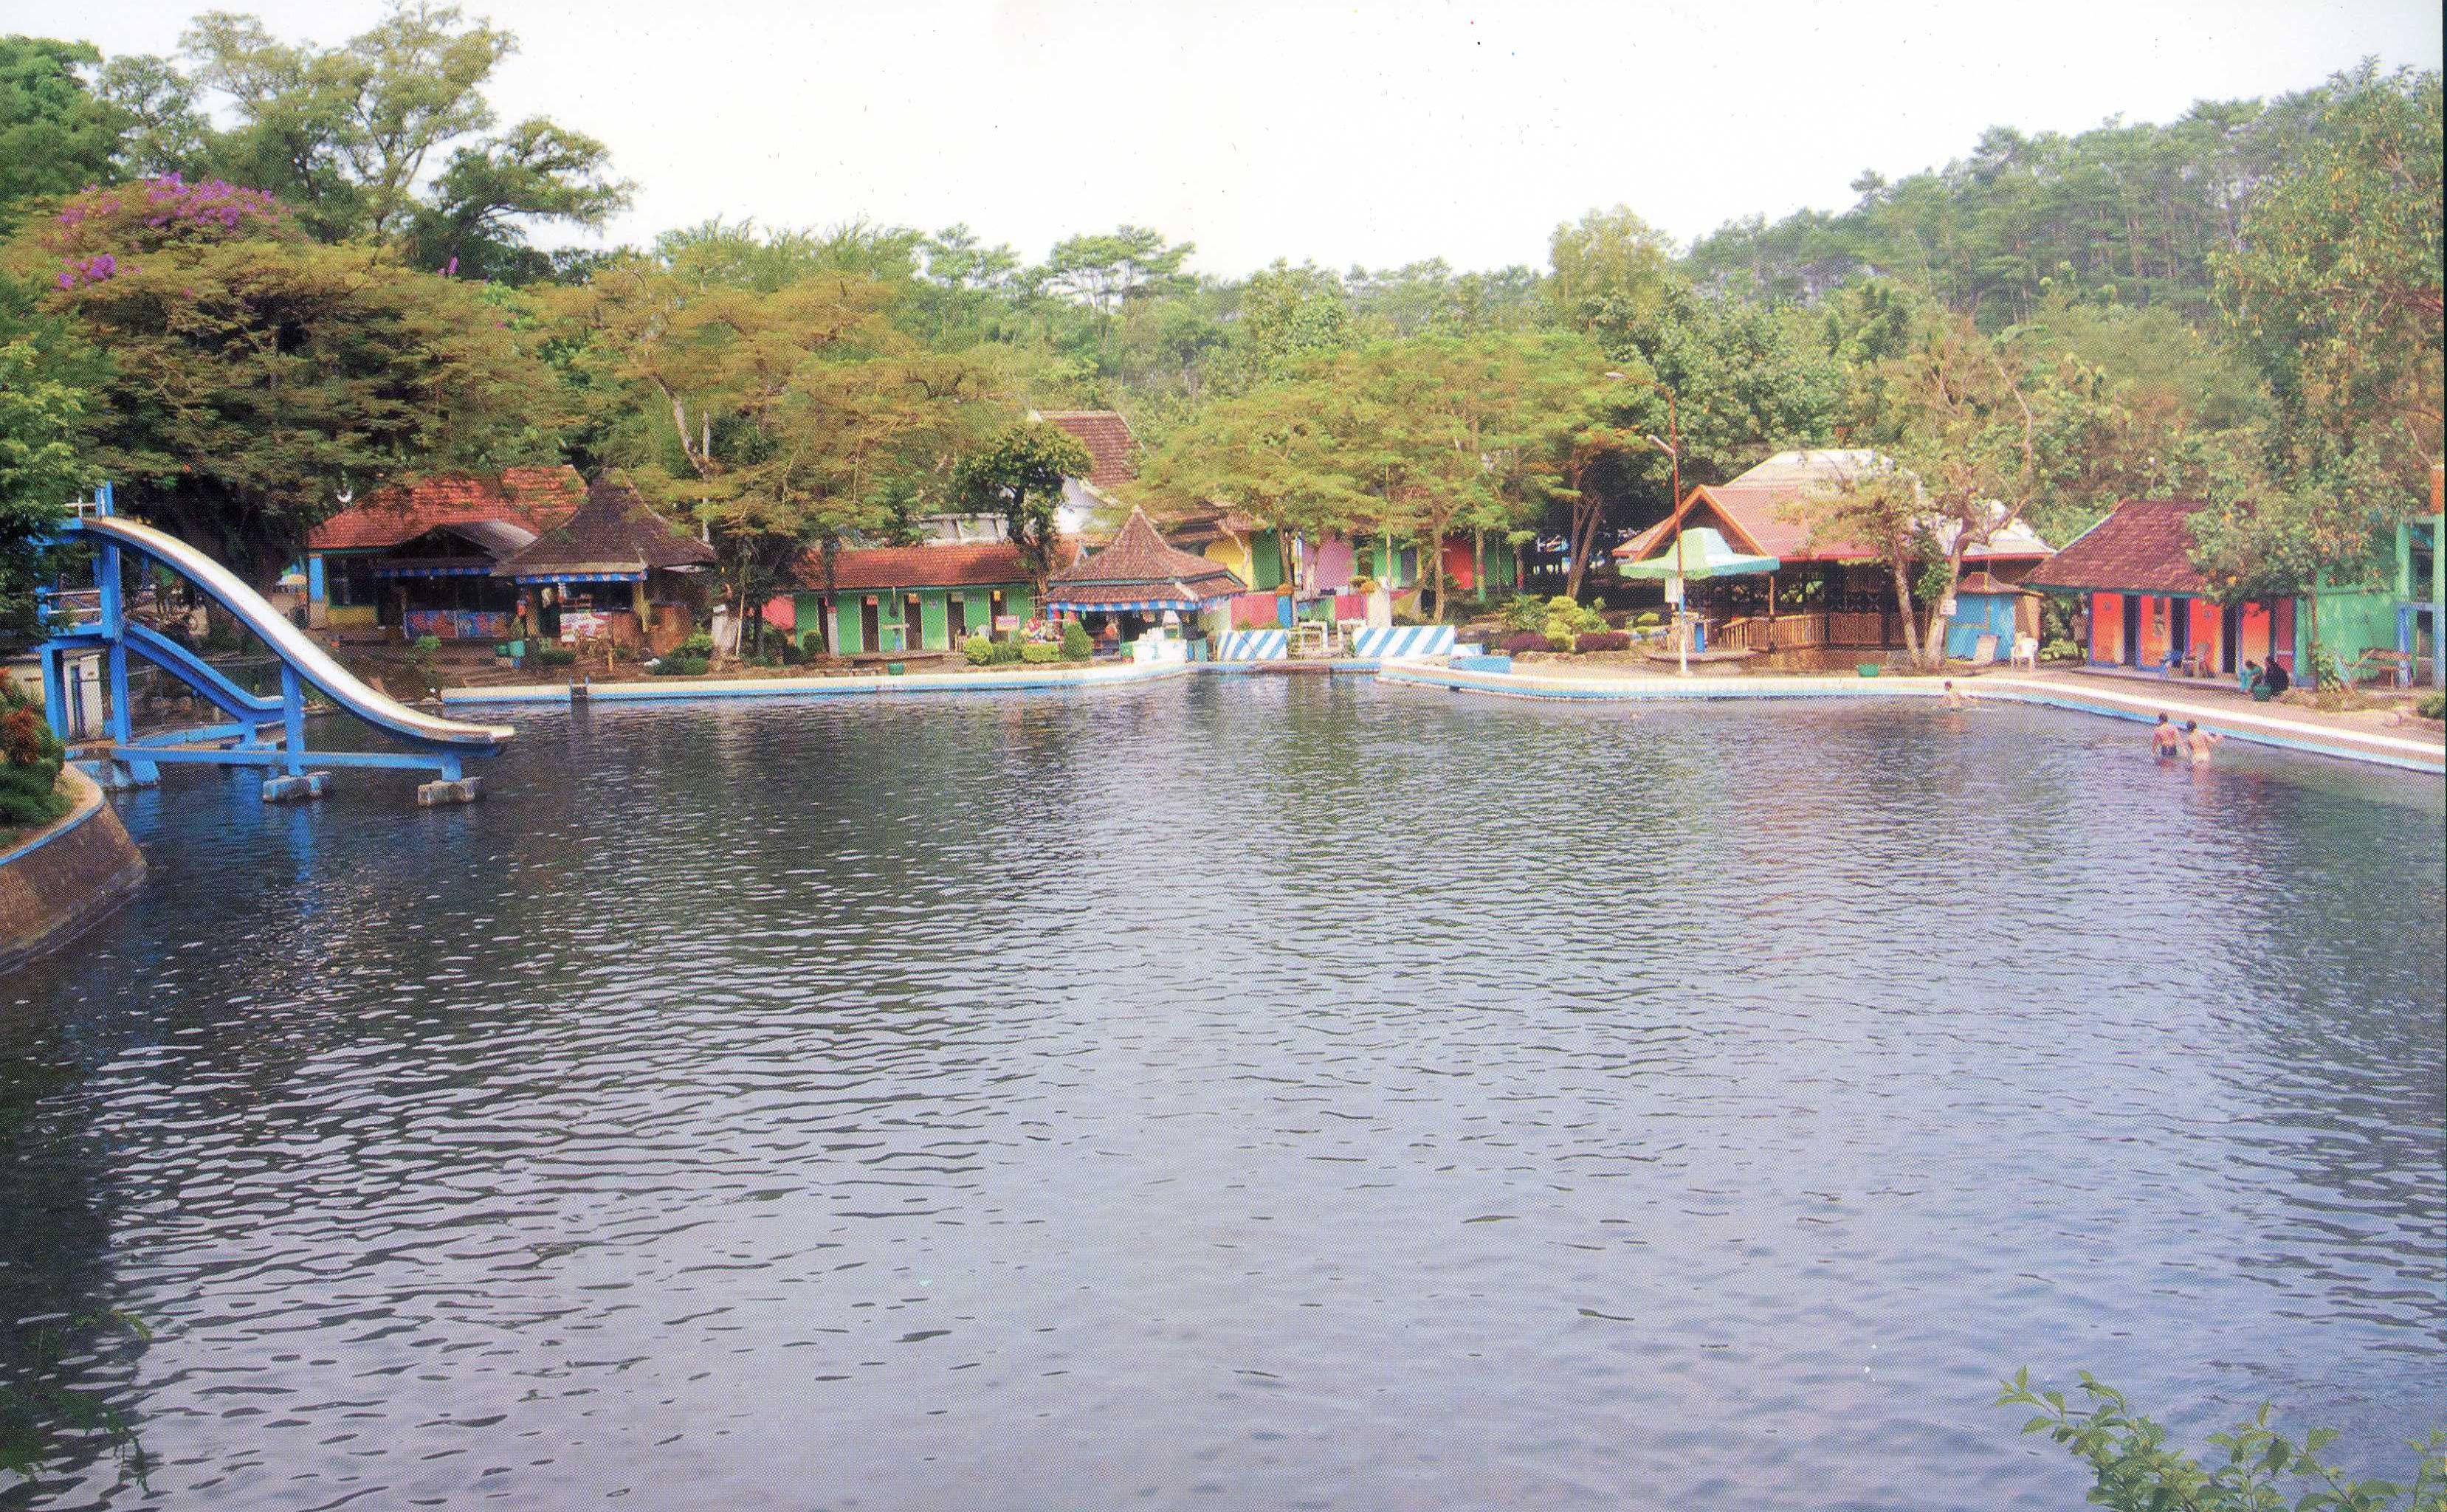 Selokambang Pemandian Alam Lumajang Pusaka Jawatimuran Kolam Renang Tirta Naga